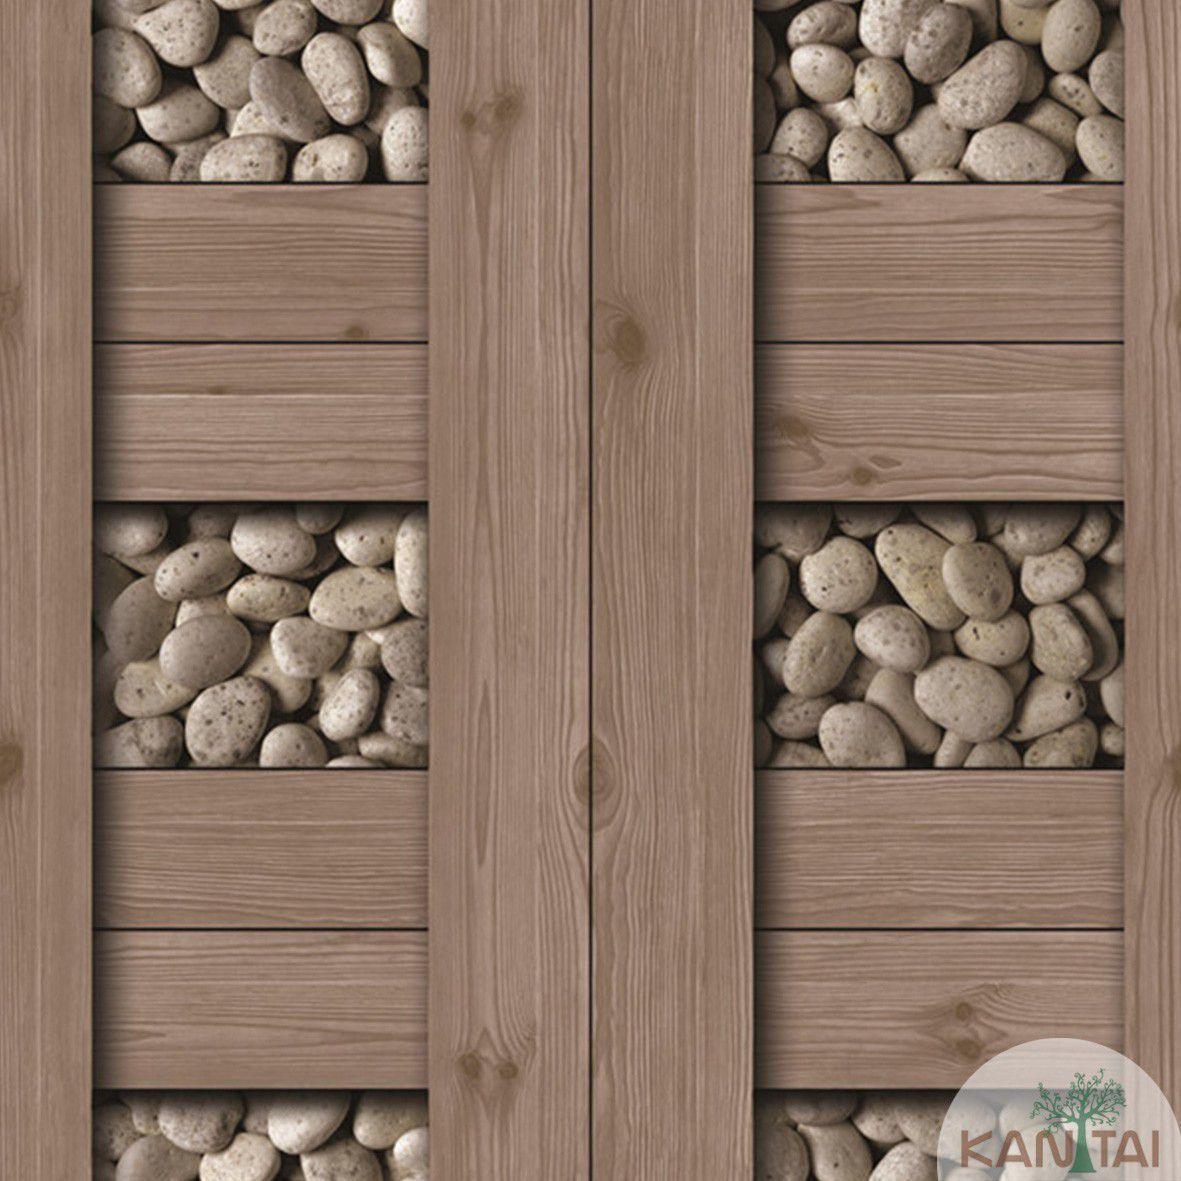 Papel de Parede   Kan Tai  Vinilico Coleção Neonature III Pedras, Tábuas Marrom Médio, Branco